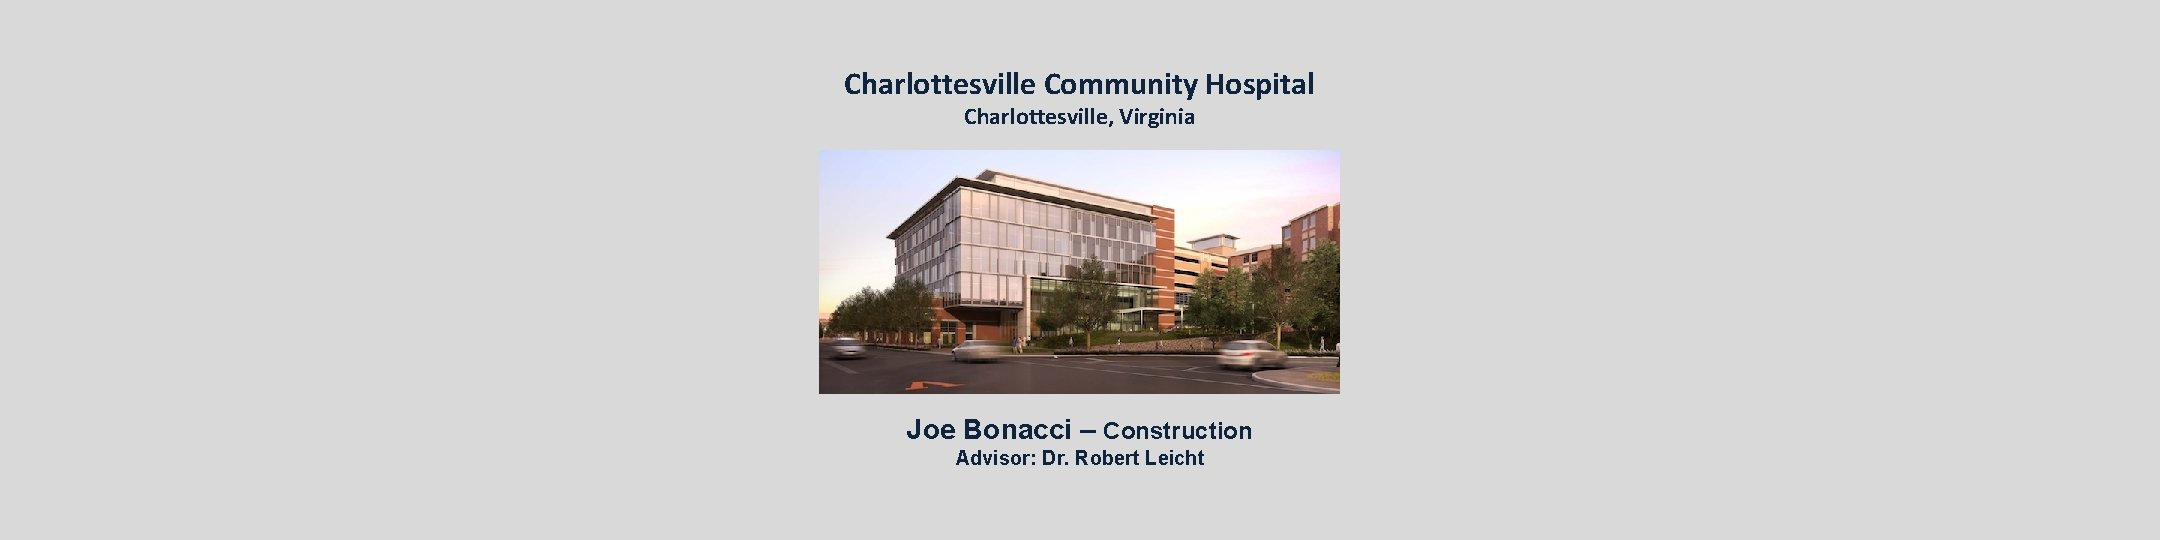 Charlottesville Community Hospital Charlottesville, Virginia Joe Bonacci – Construction Advisor: Dr. Robert Leicht